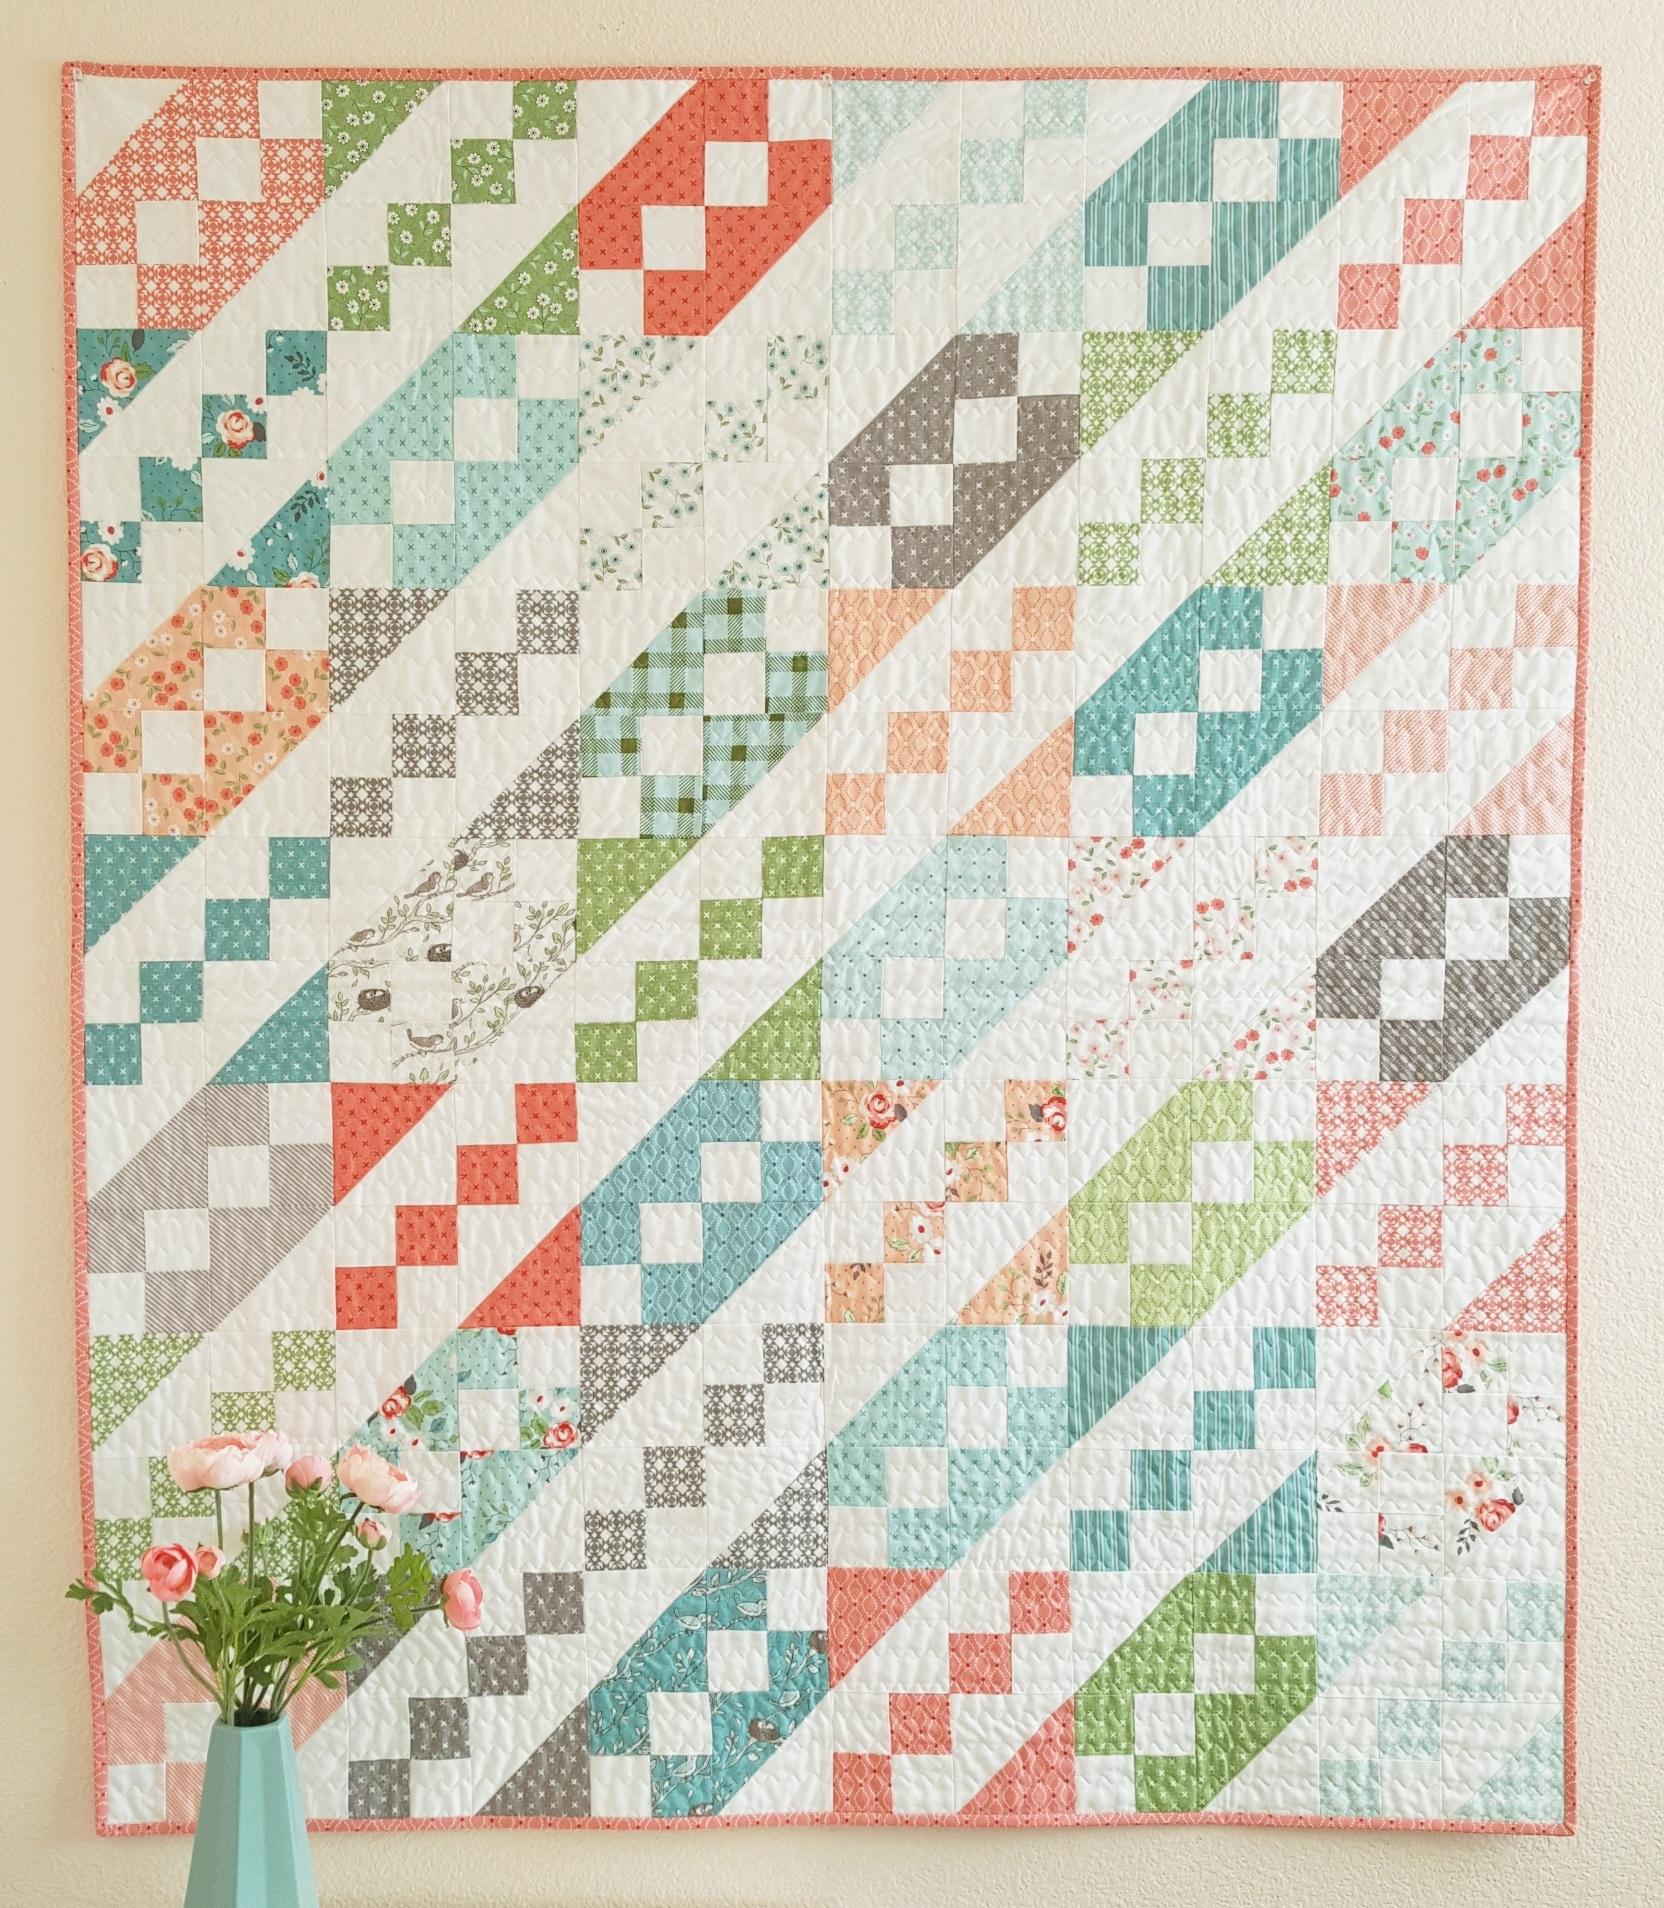 Jane S Ladder Quilt Modafabrics Com